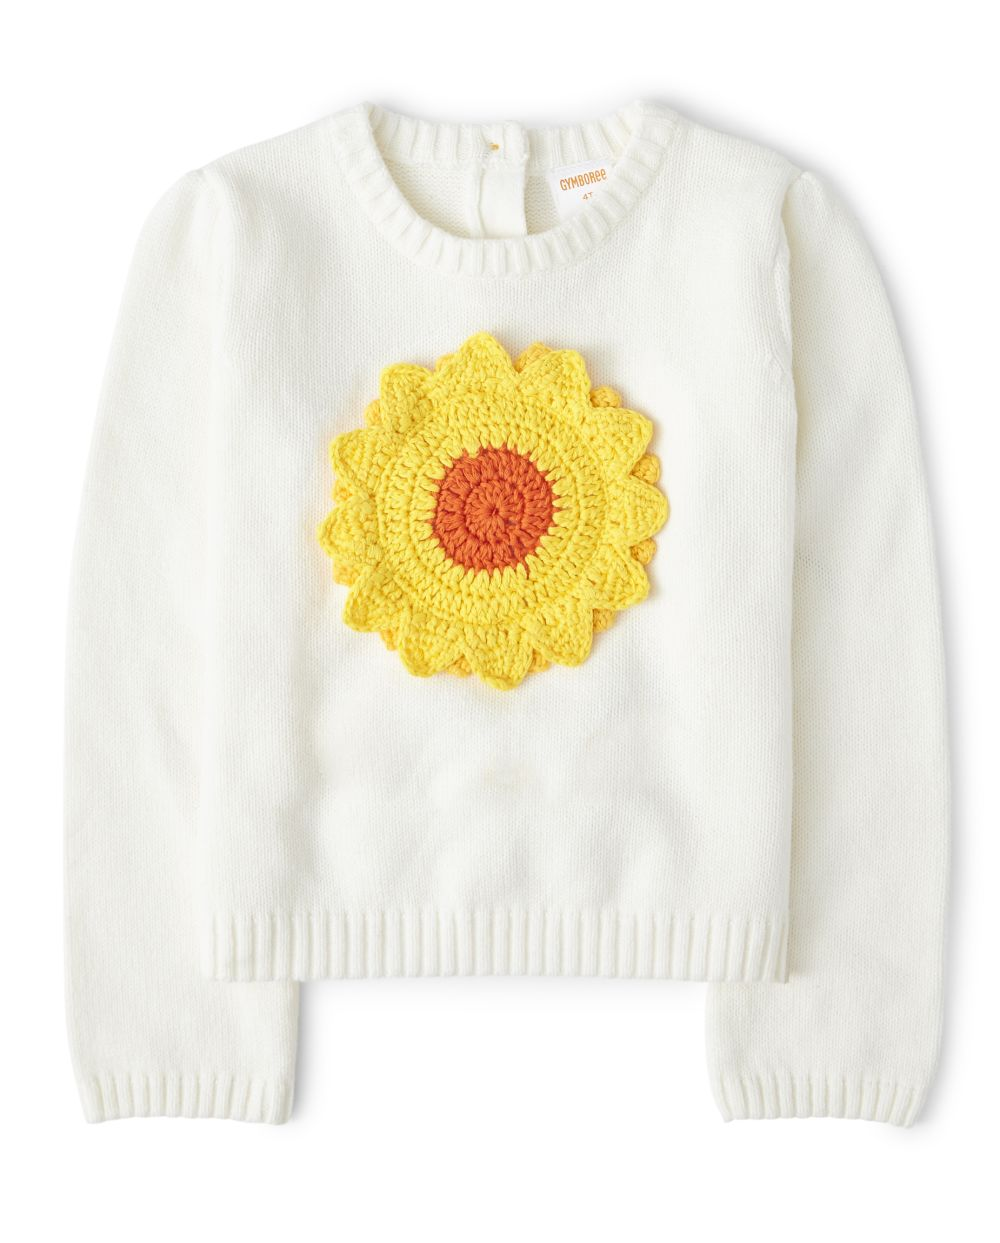 Girls Crochet Applique Sunflower Sweater - Harvest